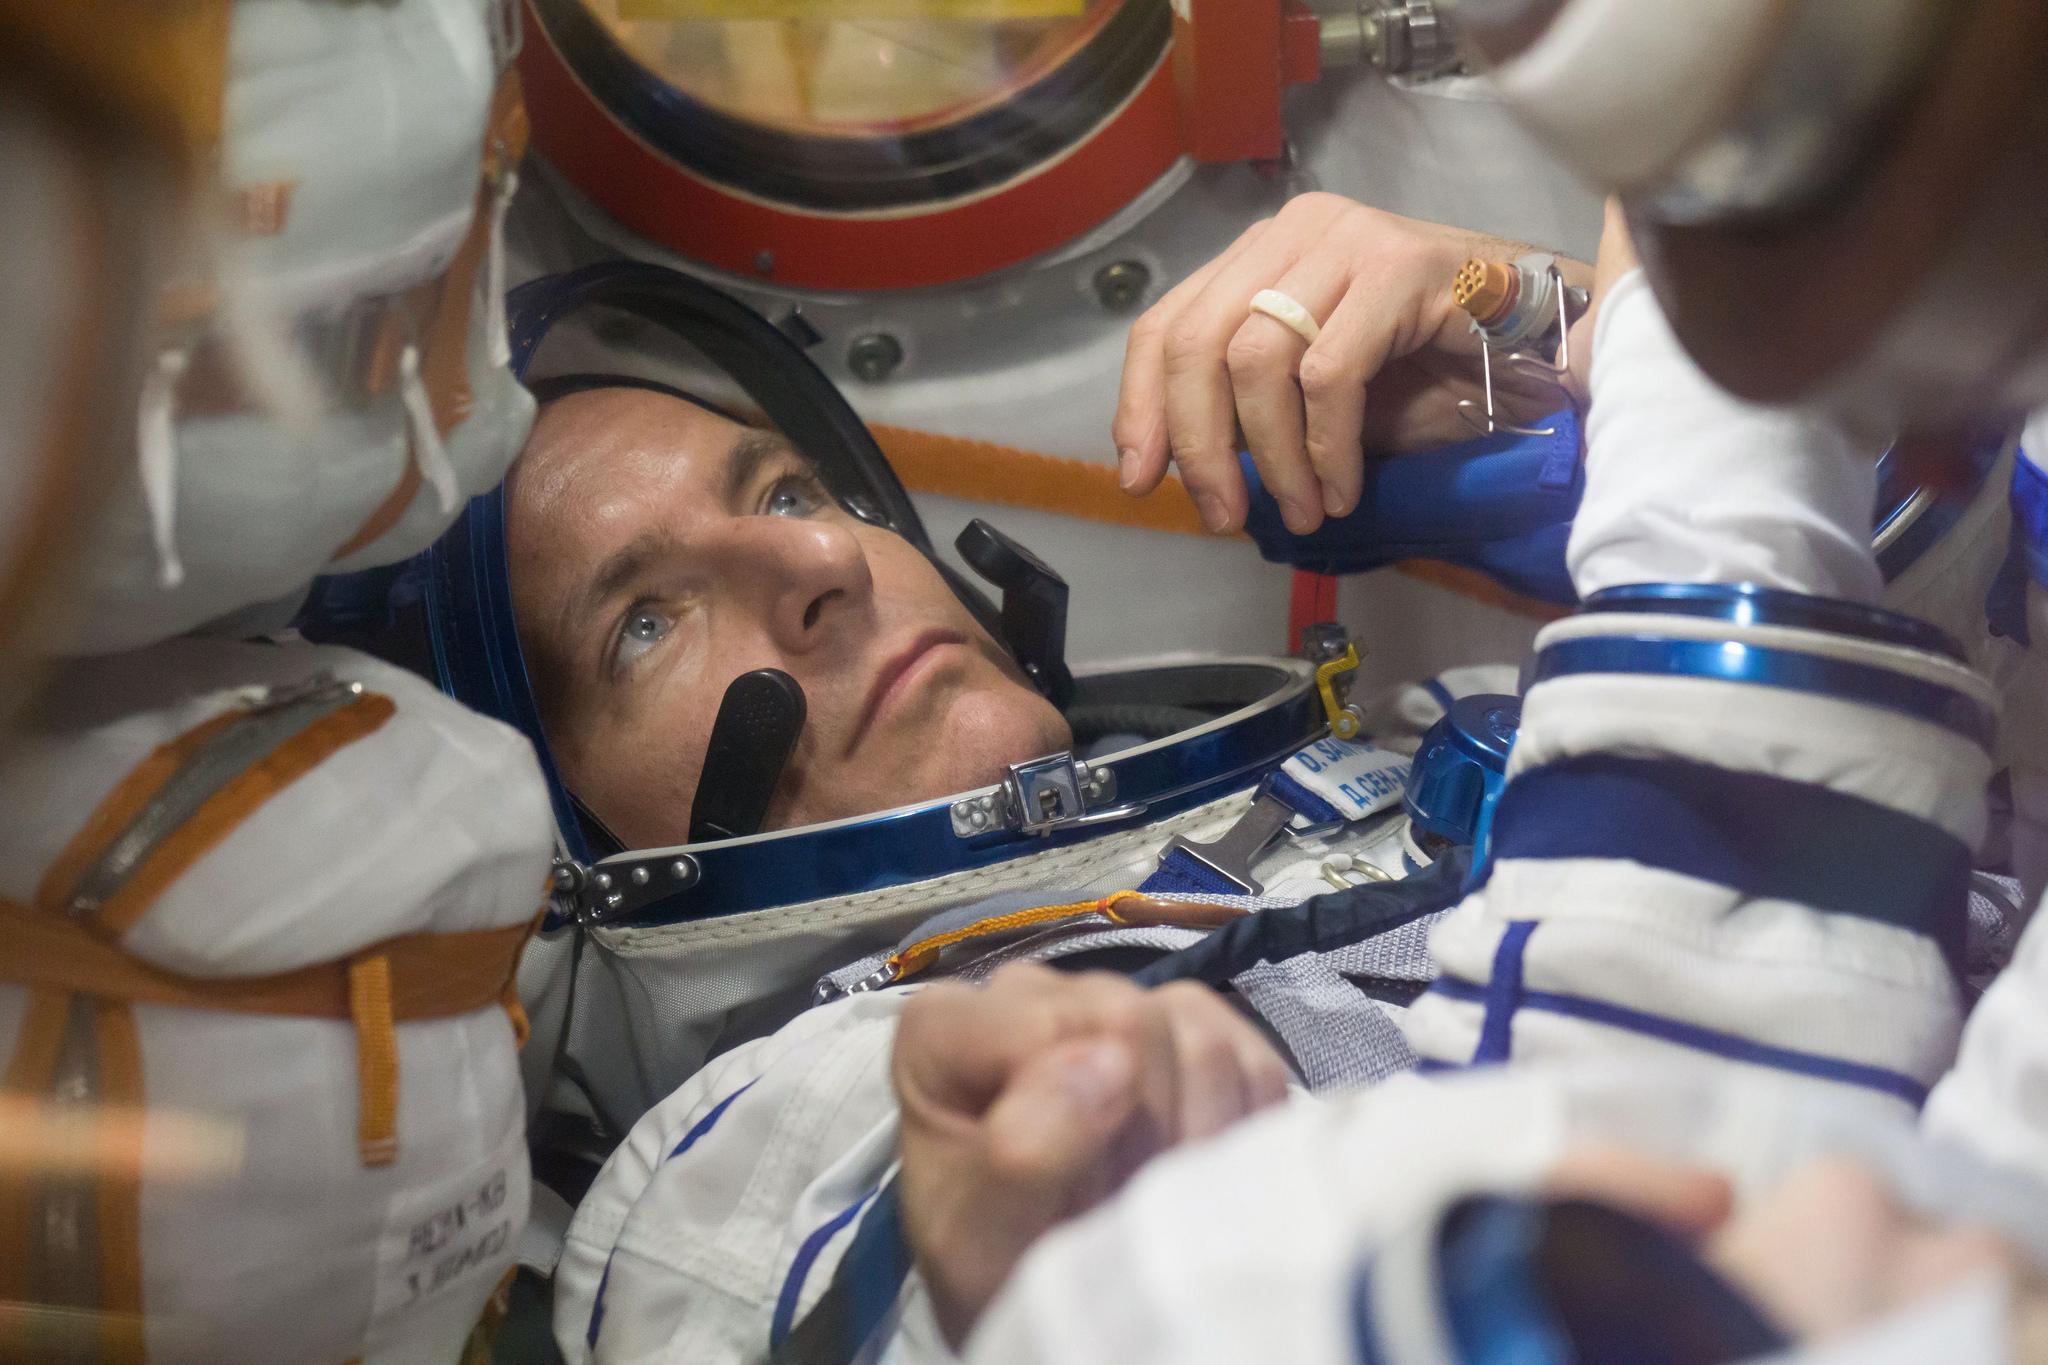 Expedition 58 crew member David Saint-Jacques